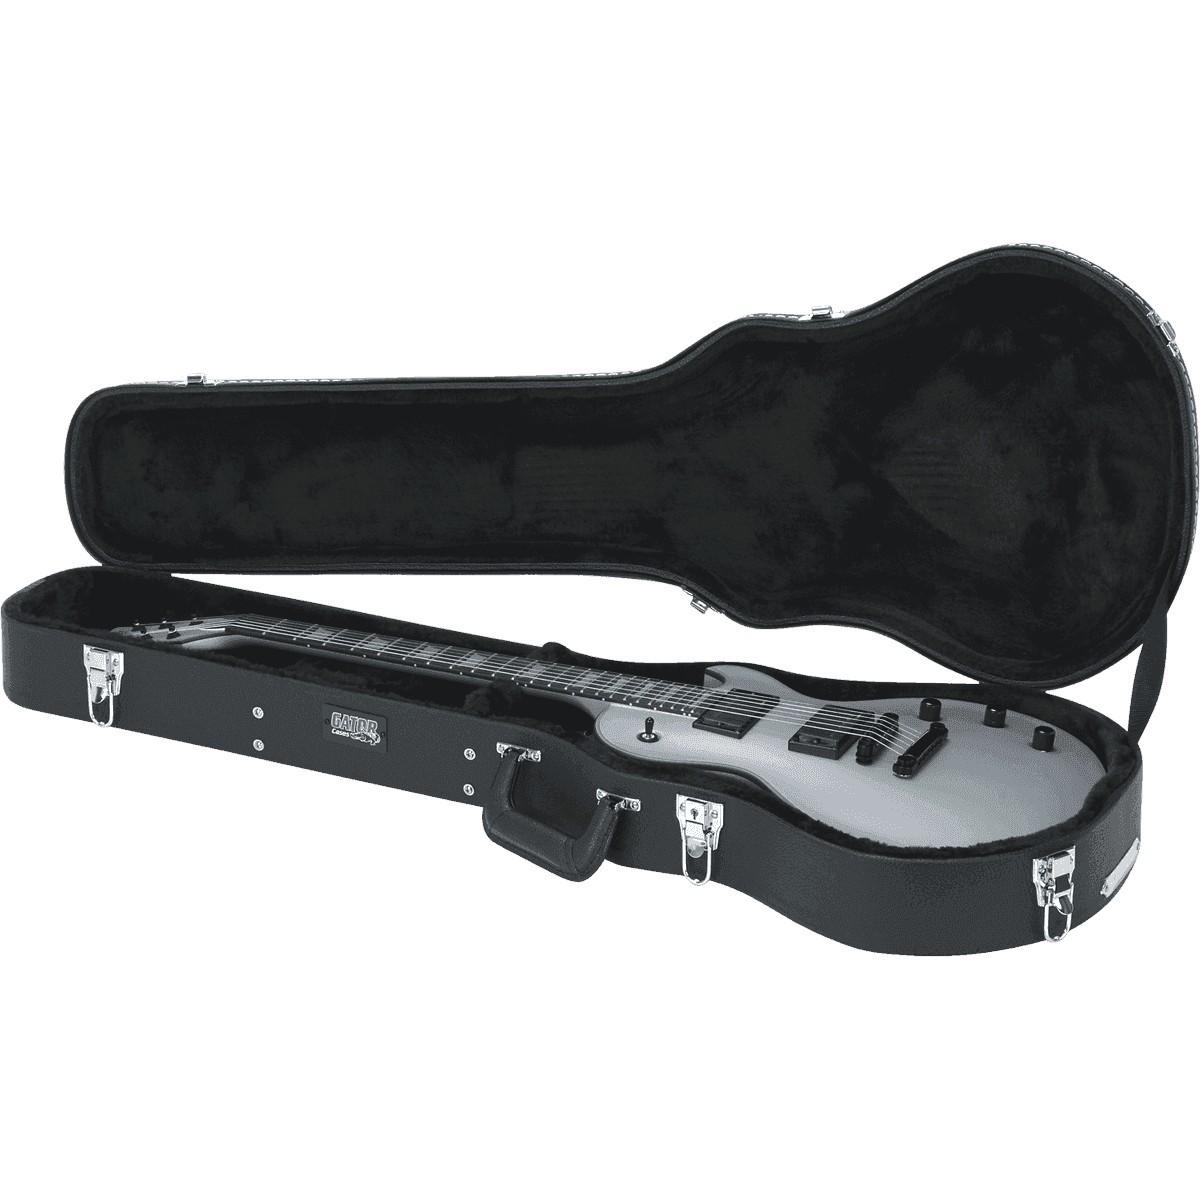 GATOR Etui Guitare Bois Deluxe GW Type Les Paul